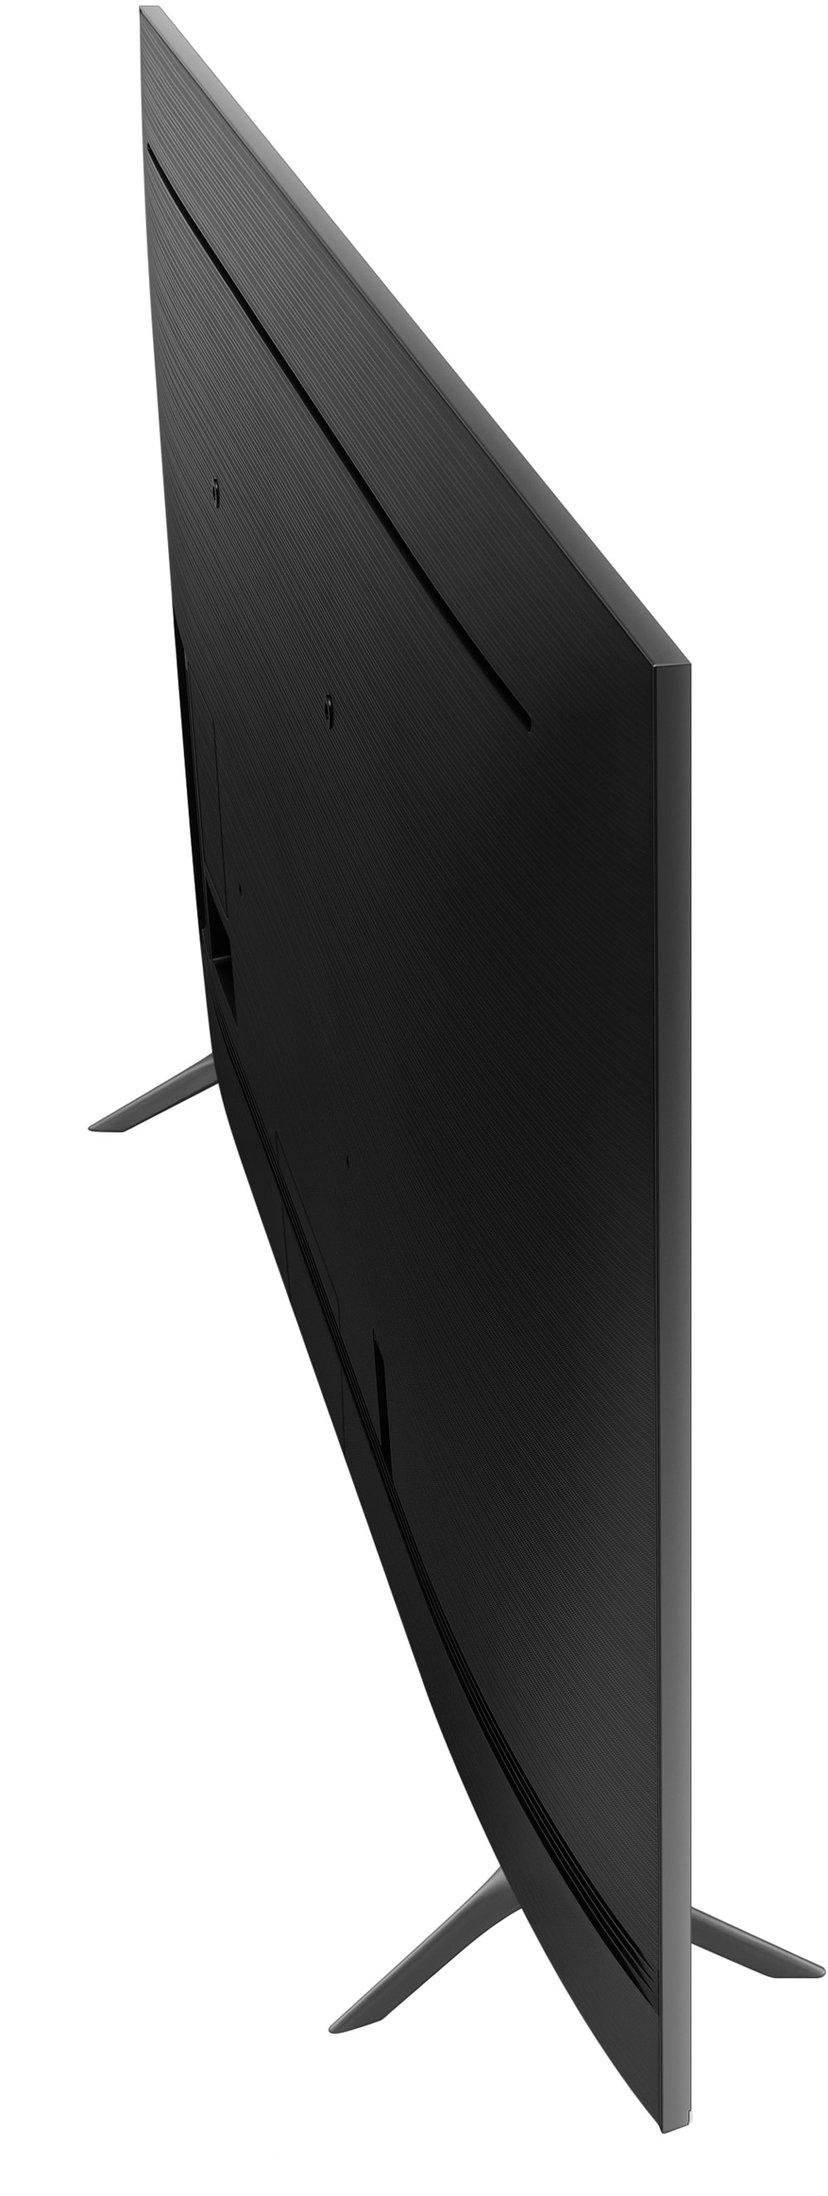 "Samsung QE65Q64T 65"" 4K QLED Smart-TV - 2020"